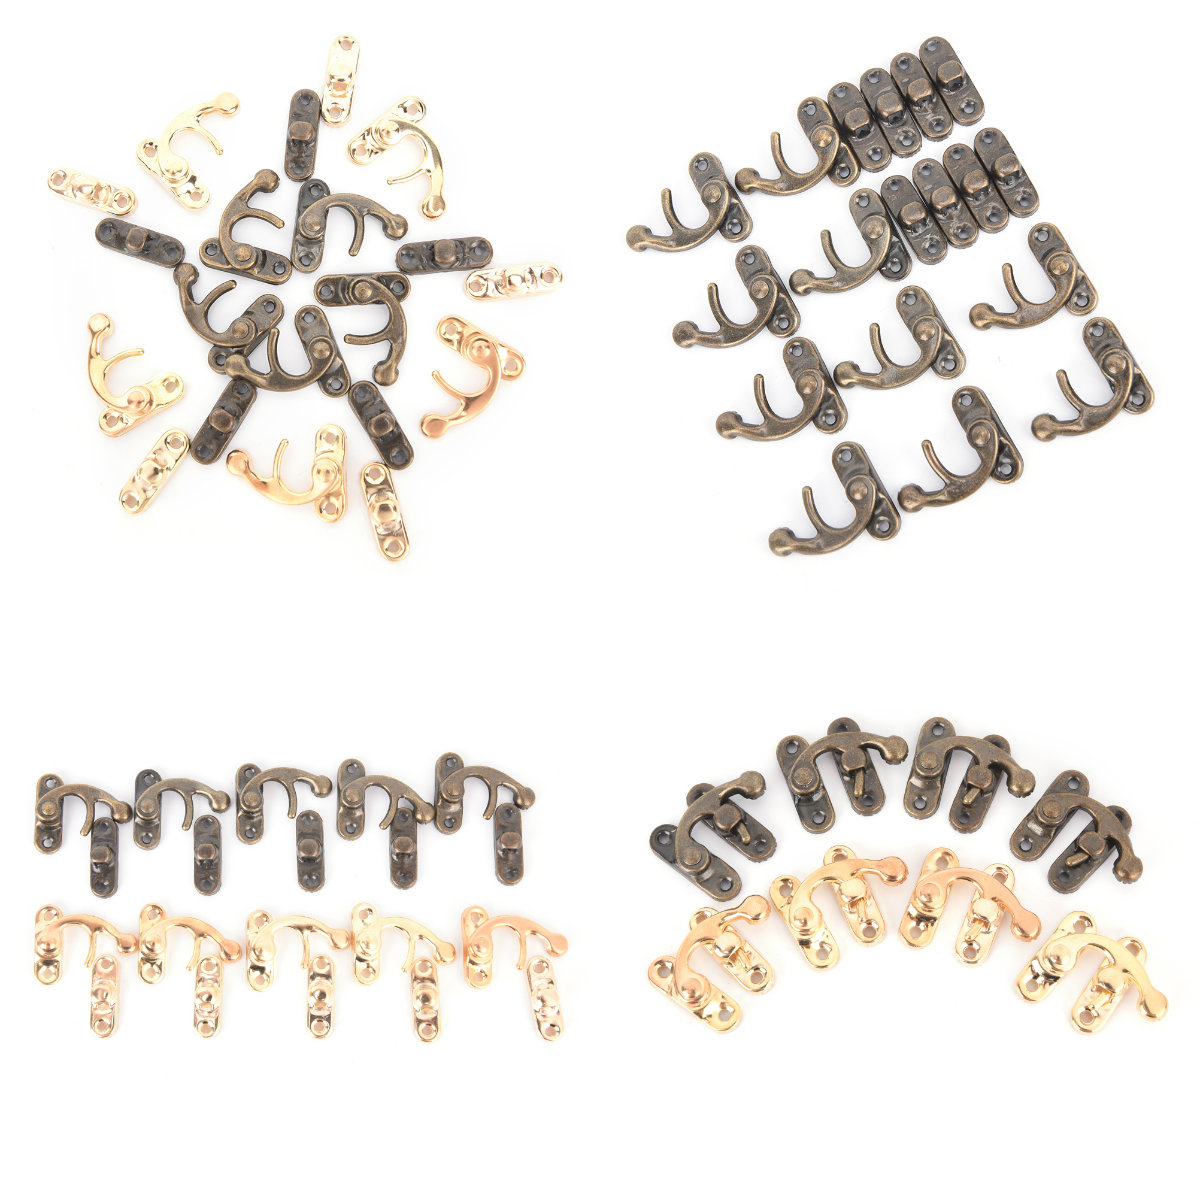 10PCS/Lot Metal Lock Catch Curved Buckle Horn Lock Clasp Hook Bag DIY Handbag Locks Closure Accessories